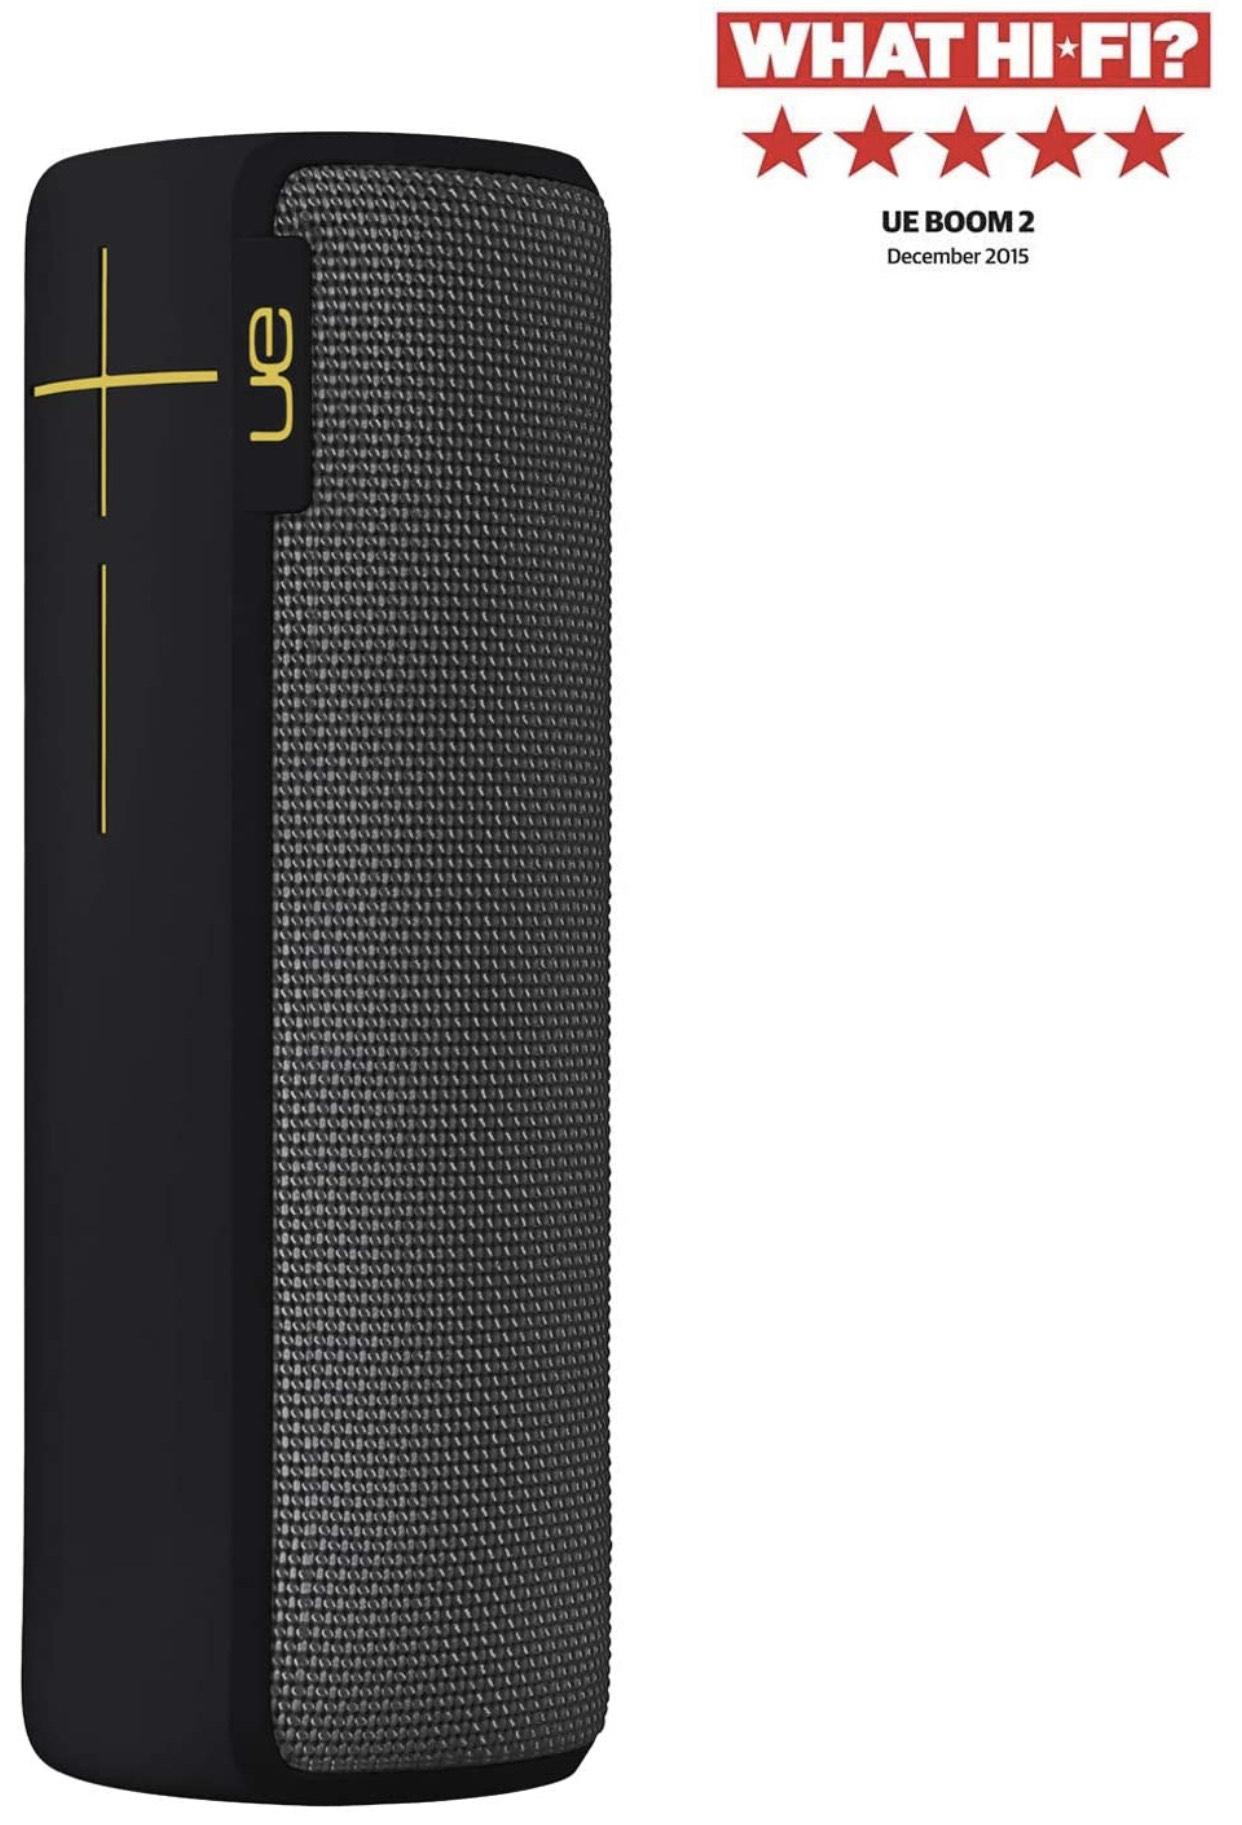 Ultimate Ears BOOM 2 Lite Wireless/Bluetooth Speaker (Waterproof and Shockproof) £60 at Amazon